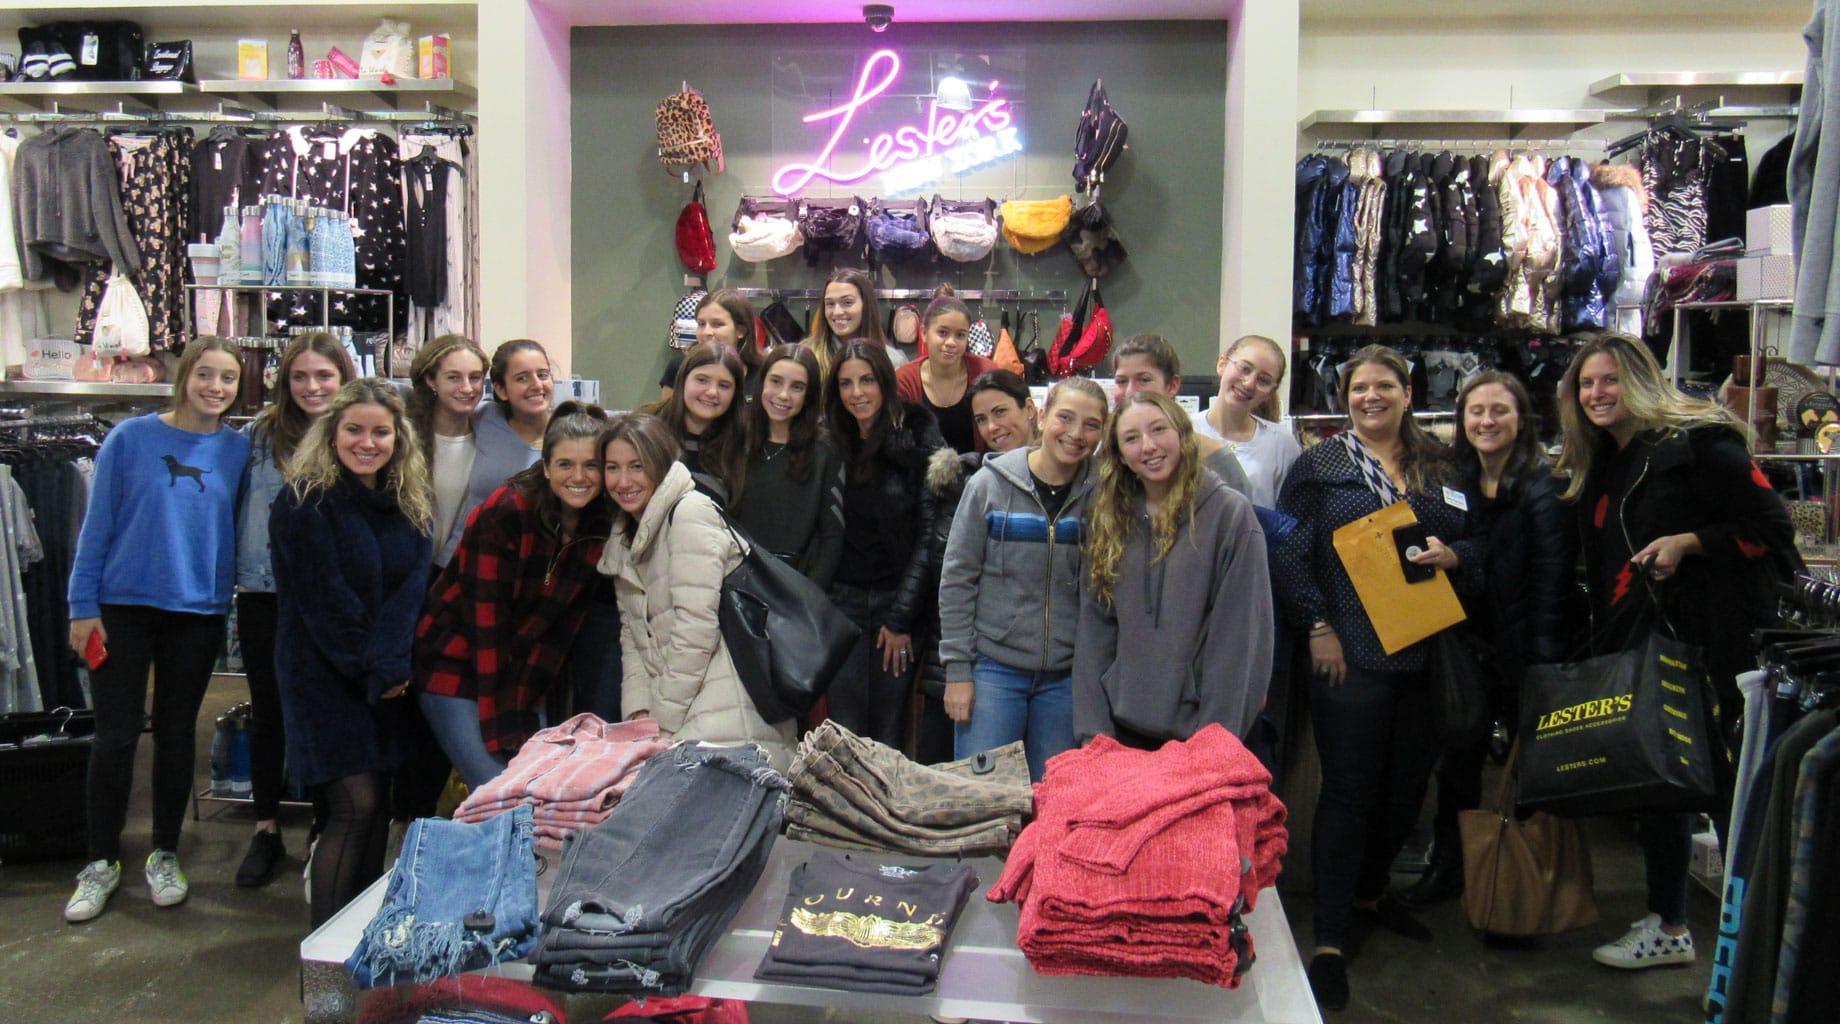 Shopping at Leslie's